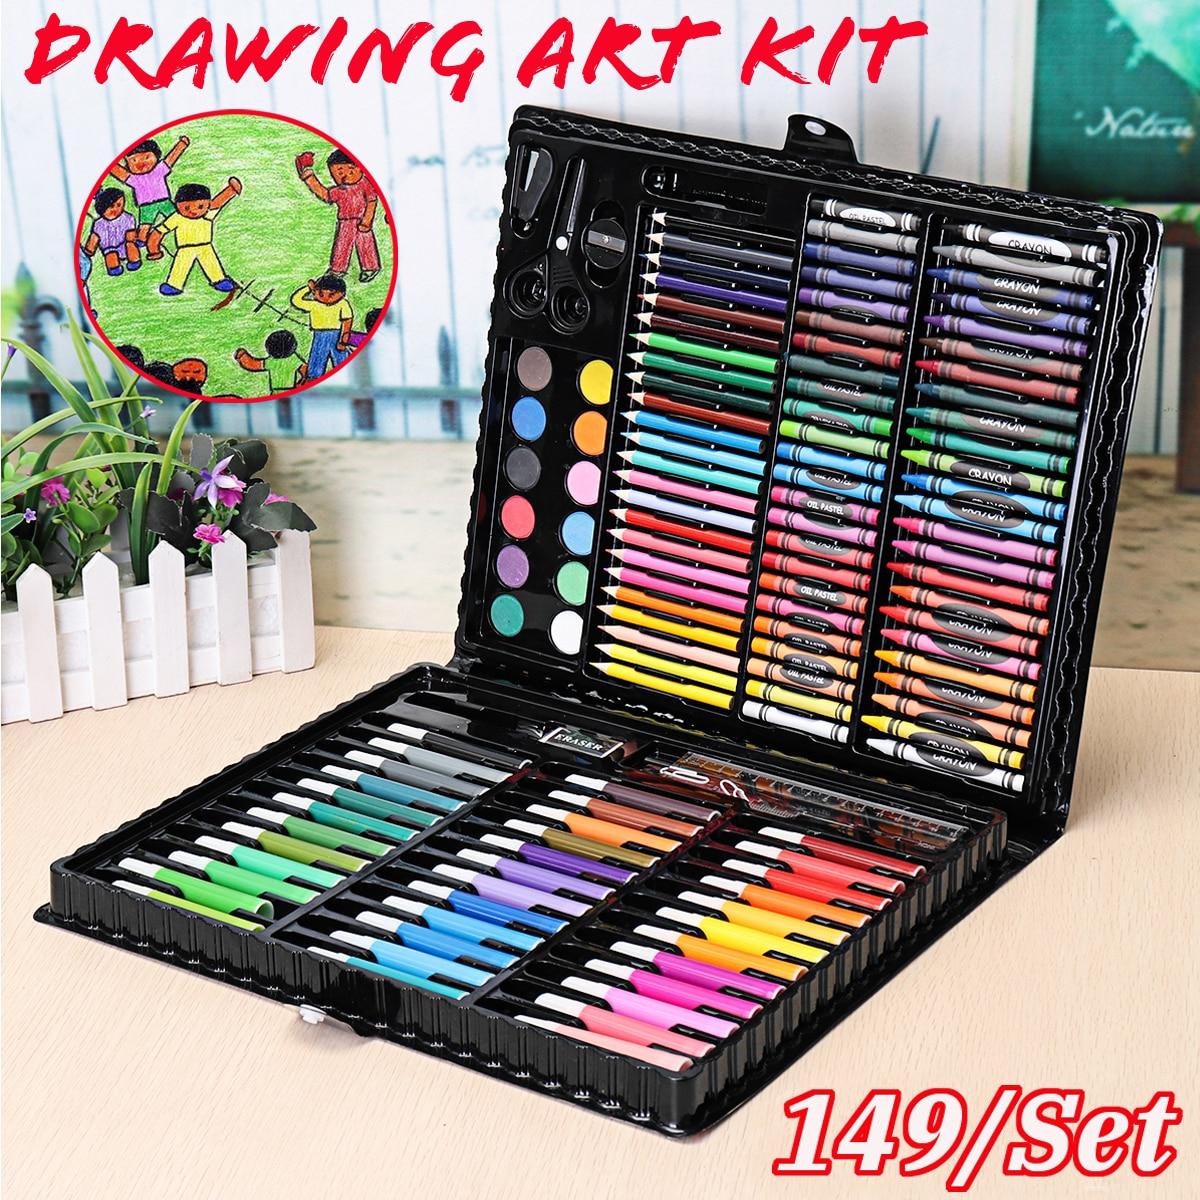 149pcs/set Paint Drawing Art Kit Complete Painting Supplies Wooden Box Set Storage Case 138 Piece Gift Pencil stanley complete painting